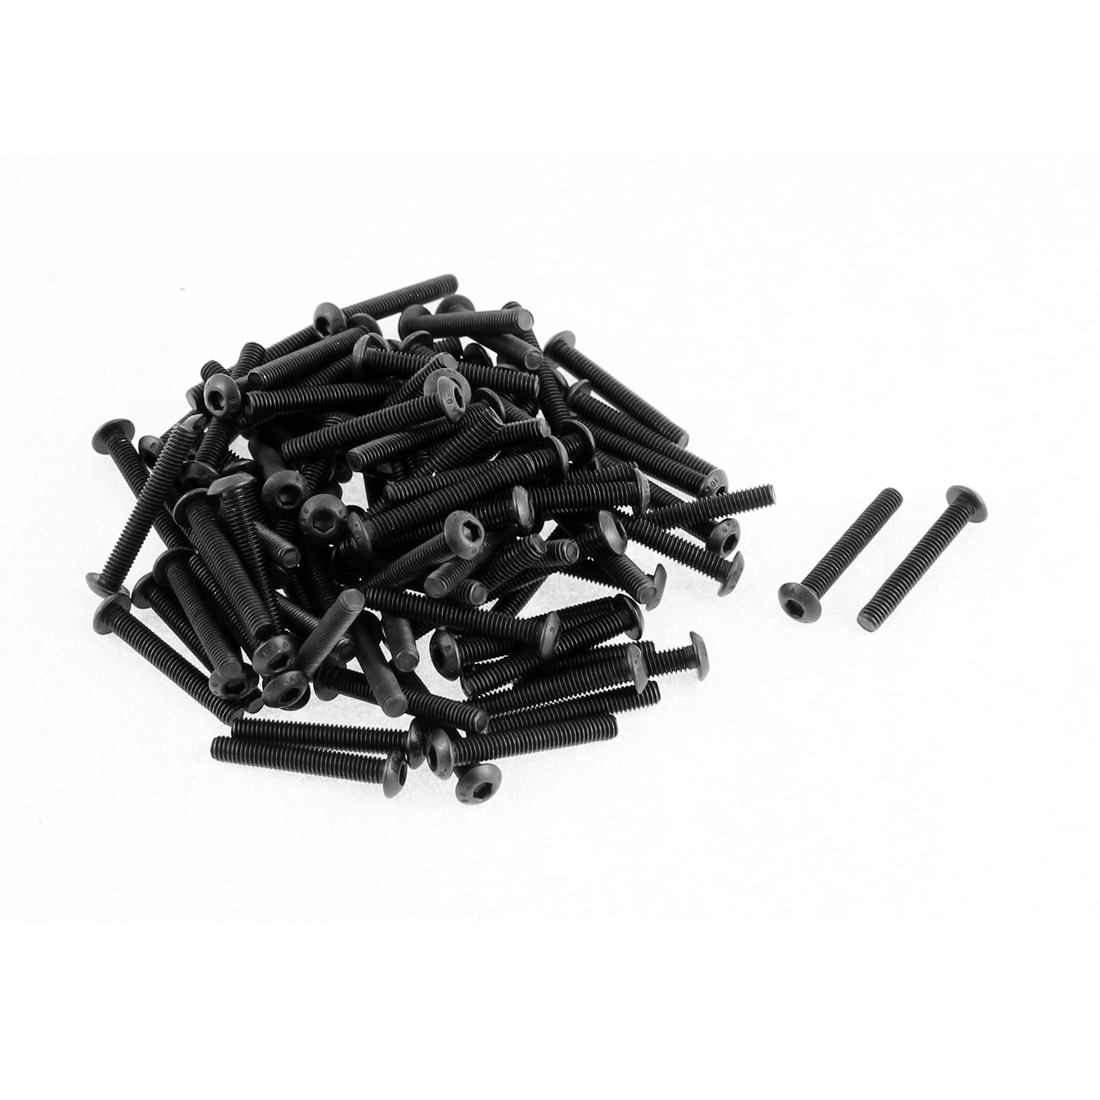 M3x20mm Thread 10.9 Alloy Steel Button Head Hex Socket Cap Screw Bolt 100pcs